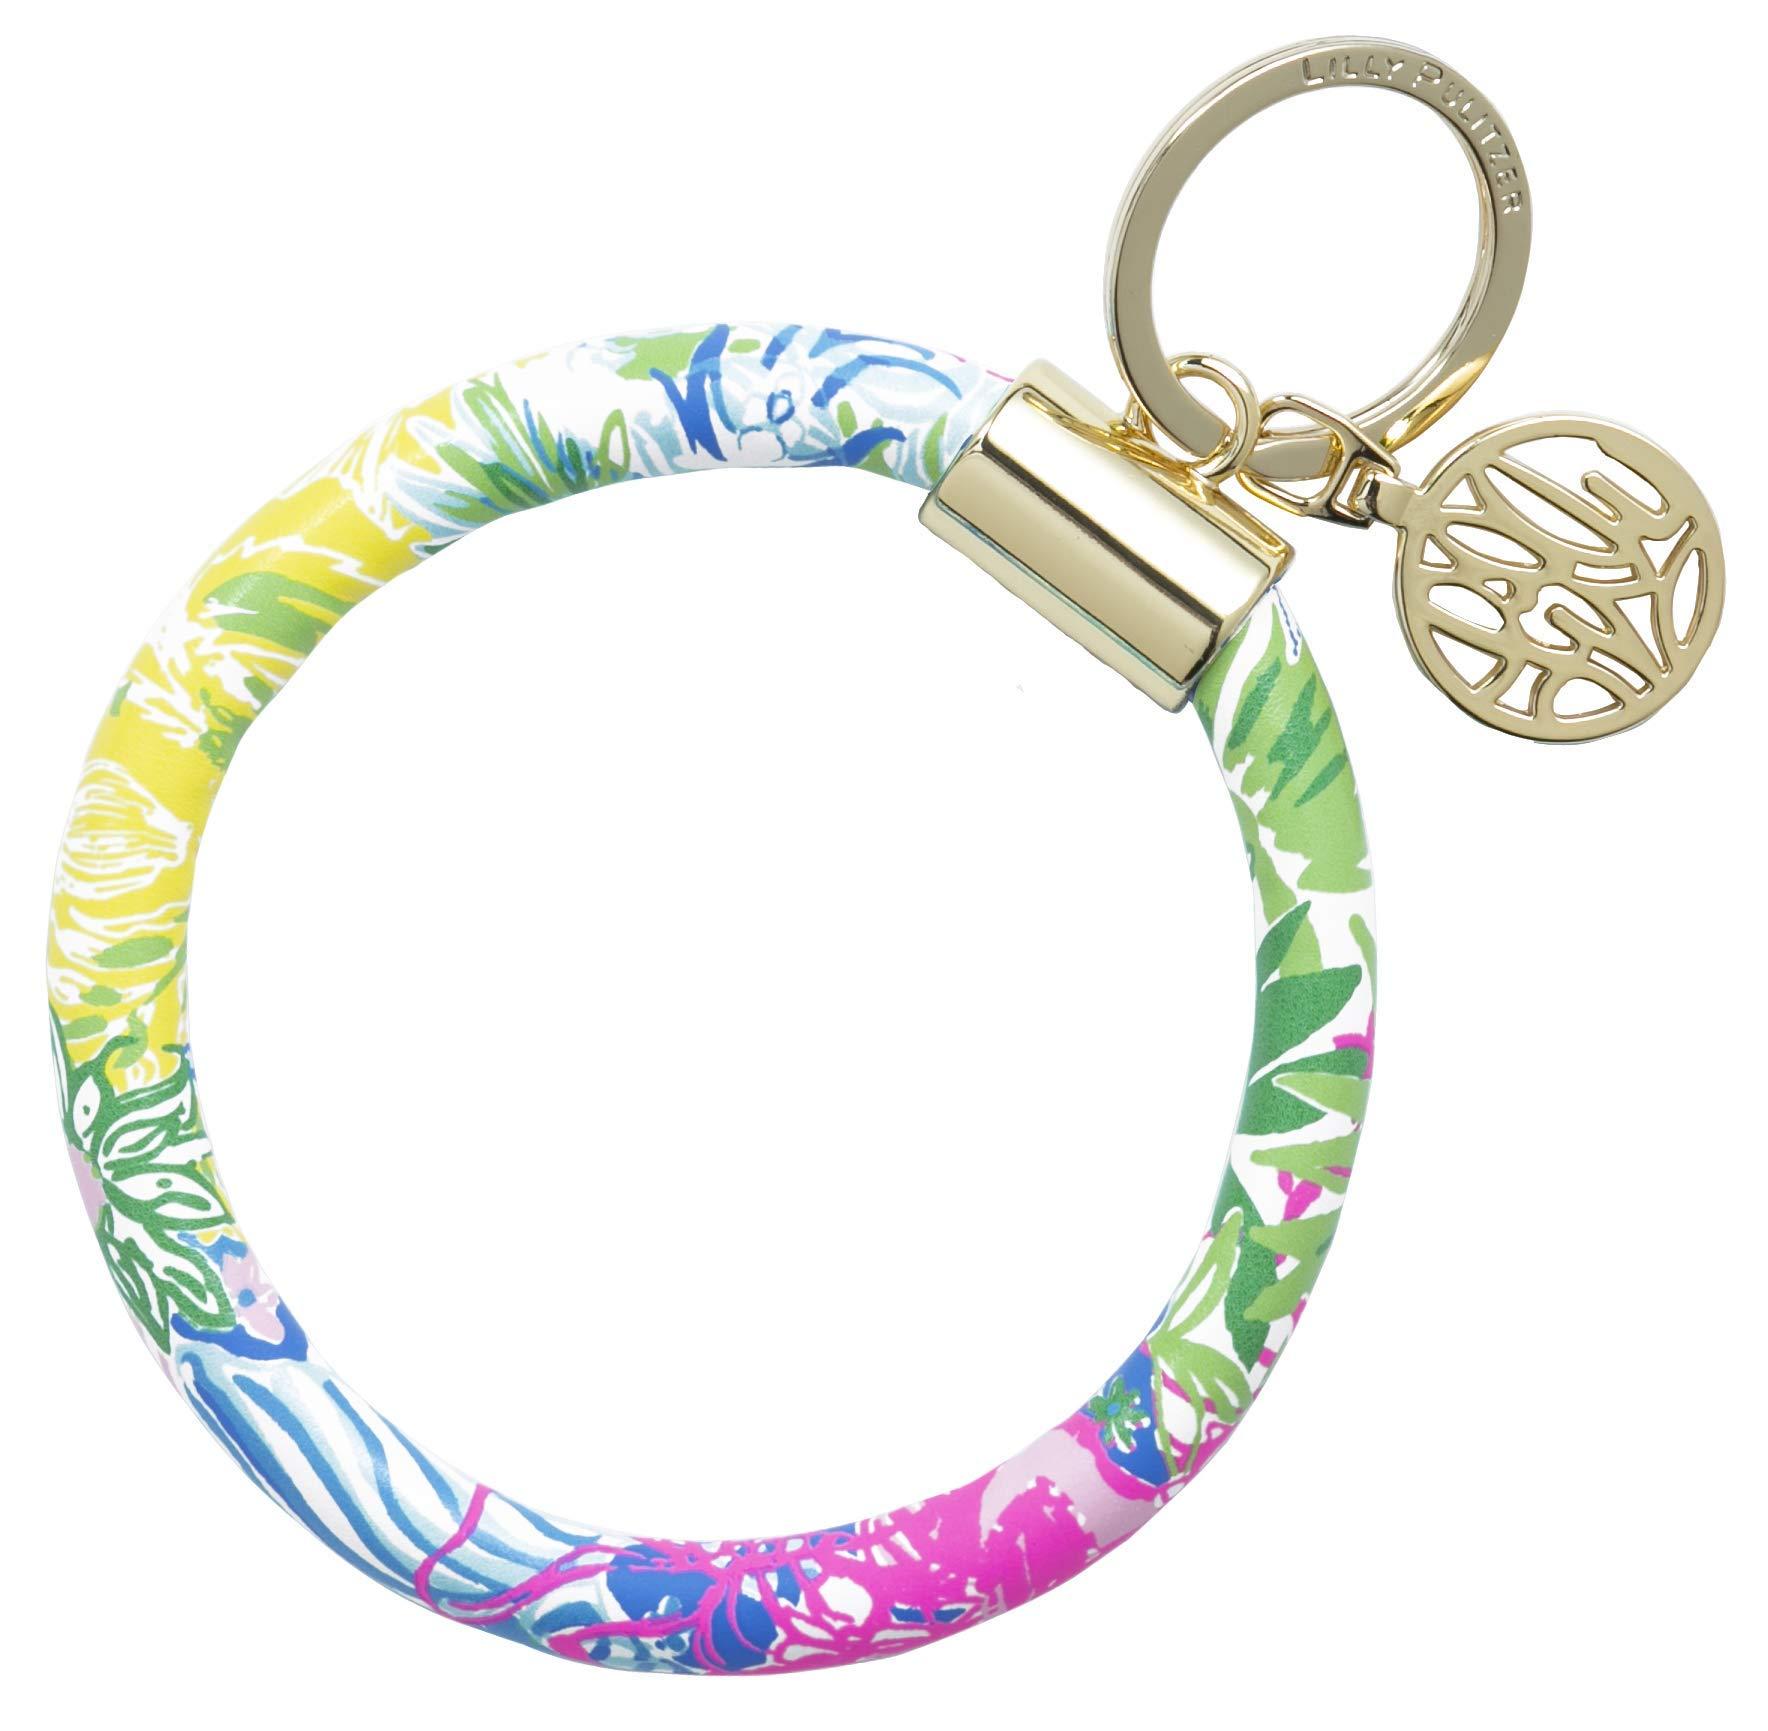 Lilly Pulitzer Bracelet Chain Cheek